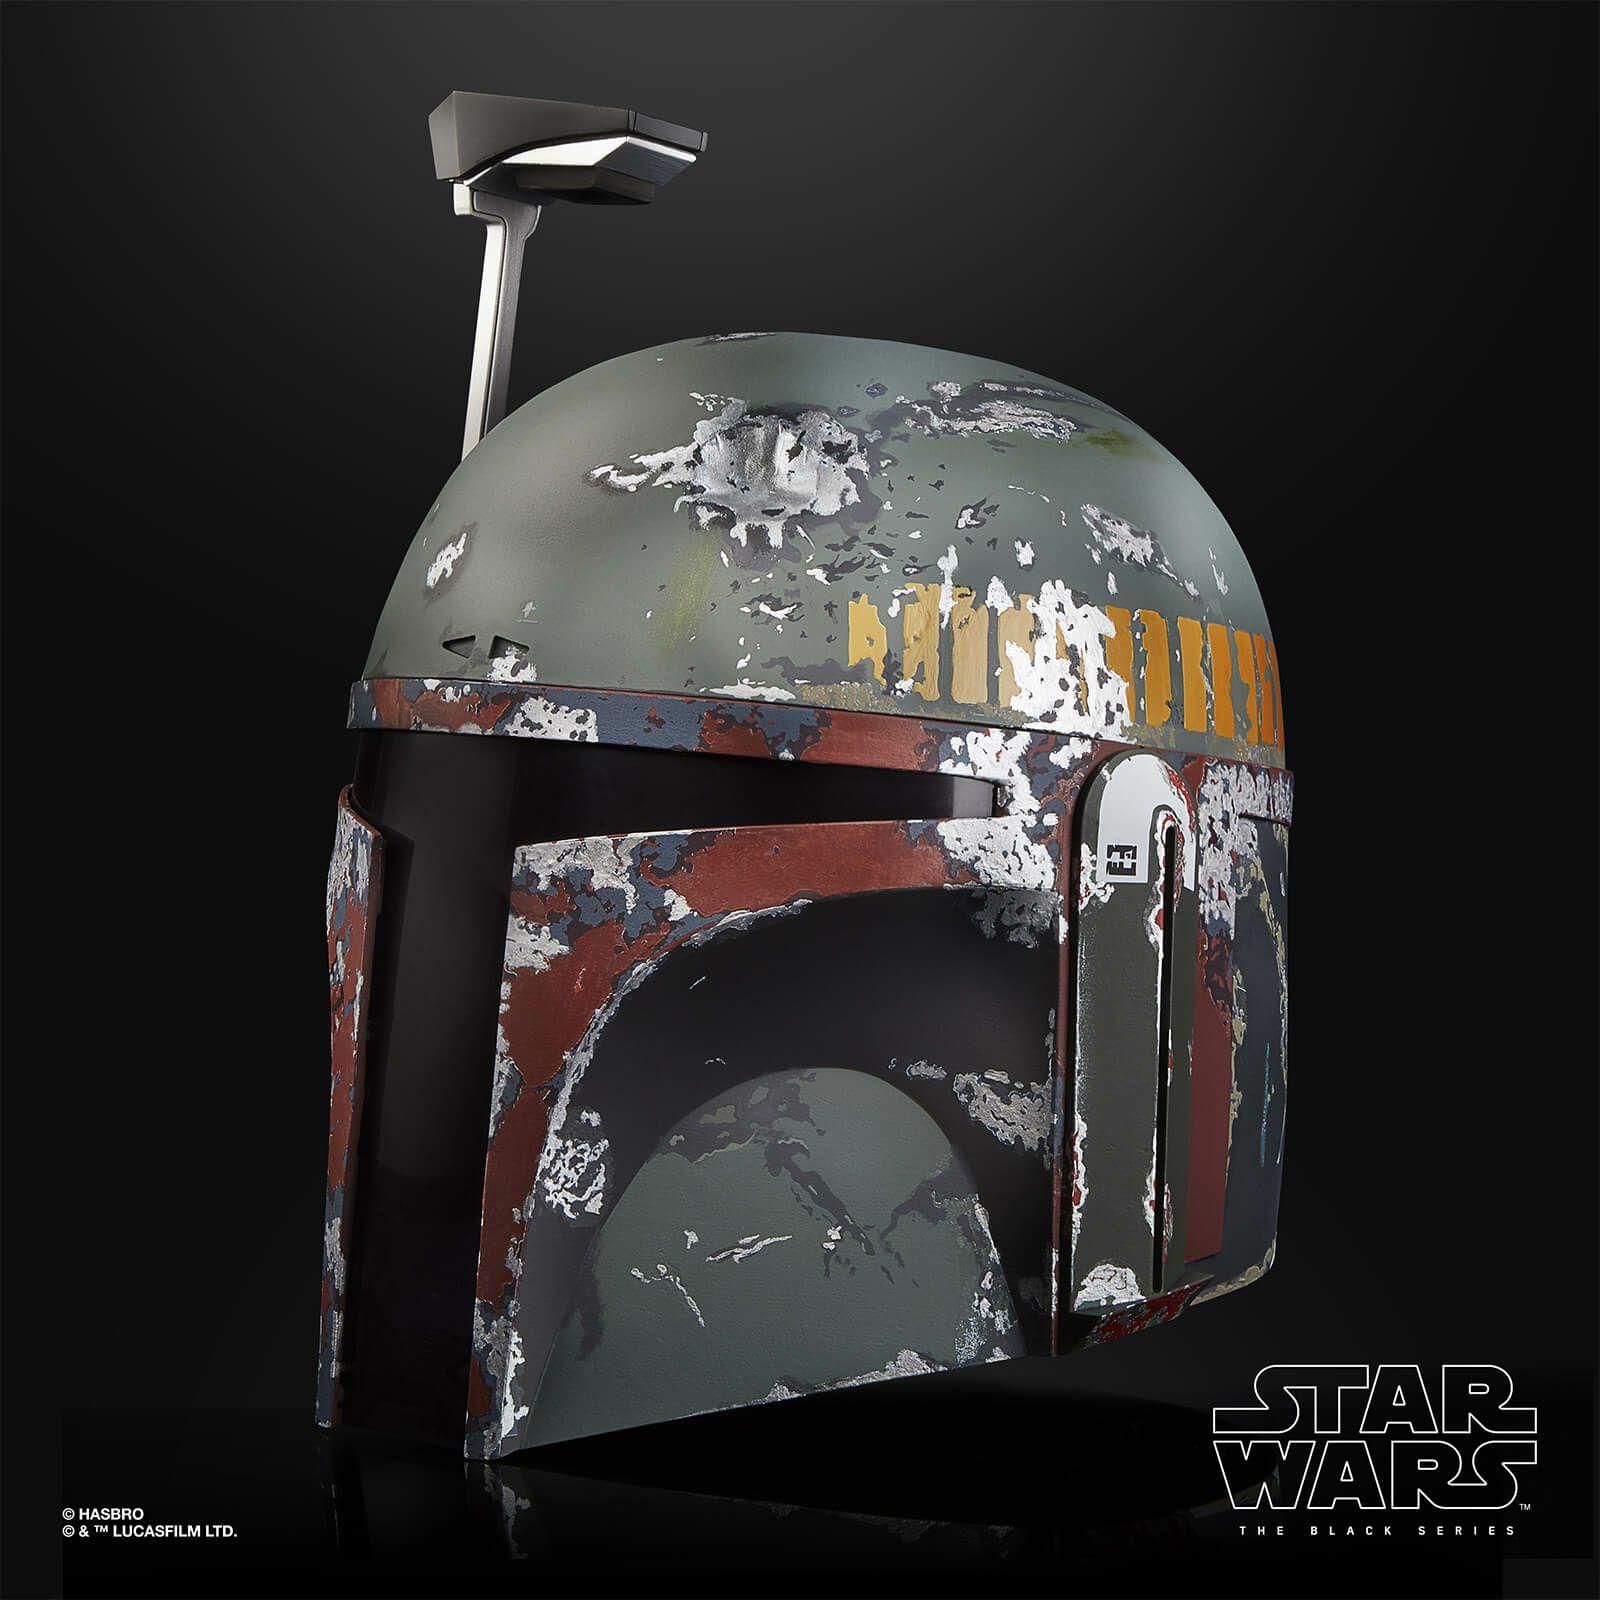 Hasbro Star Wars The Black Series Boba Fett Electronic Helmet £109.99 @ Scan